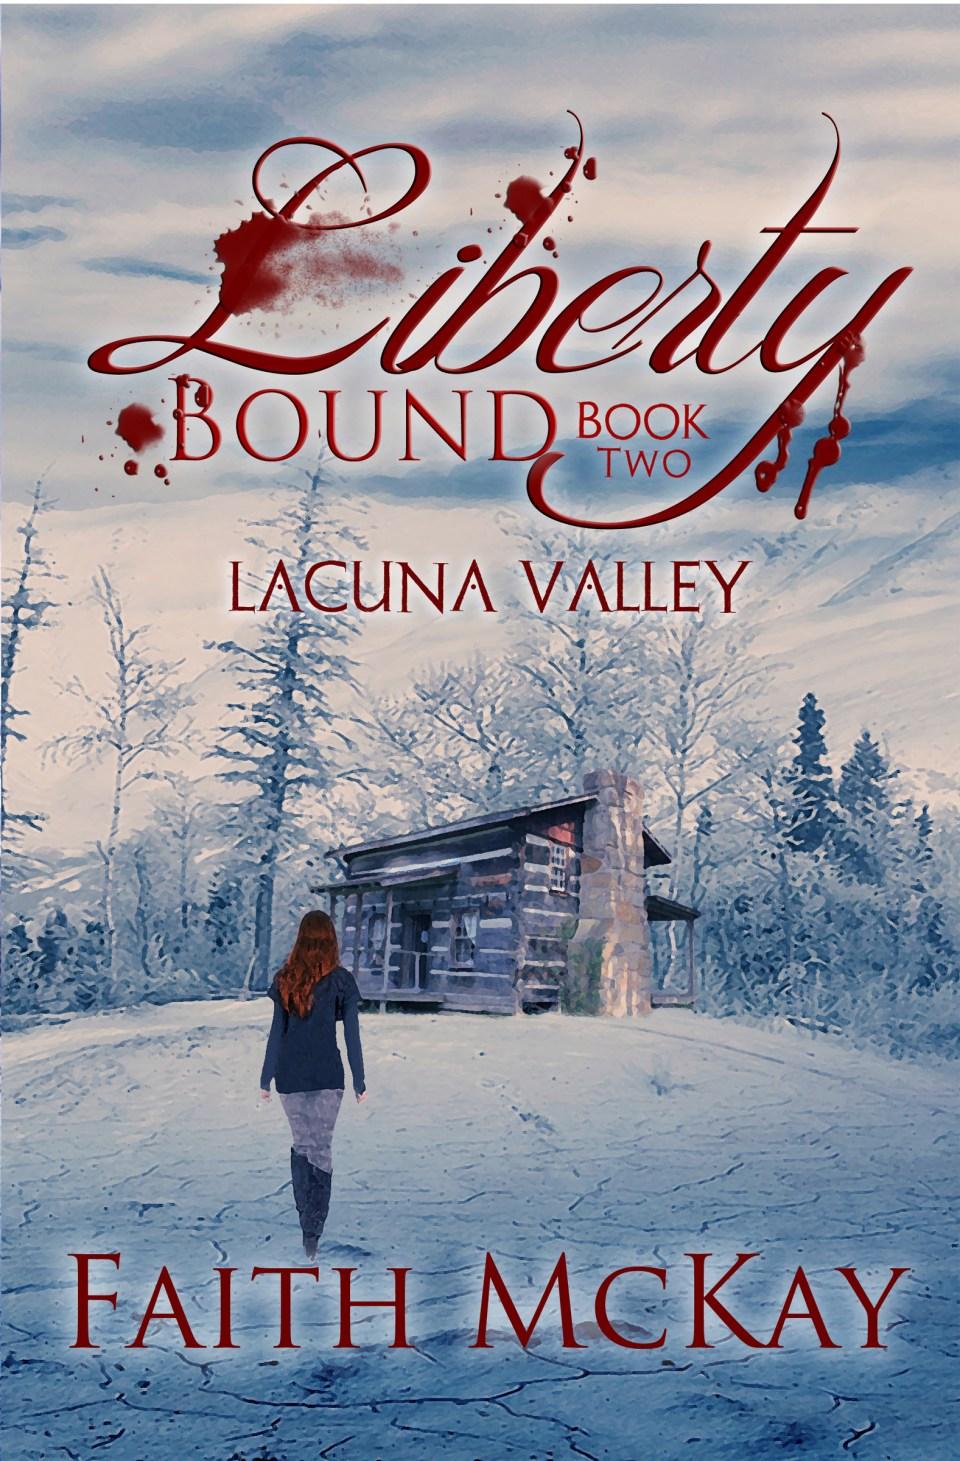 Liberty Bound by Faith McKay